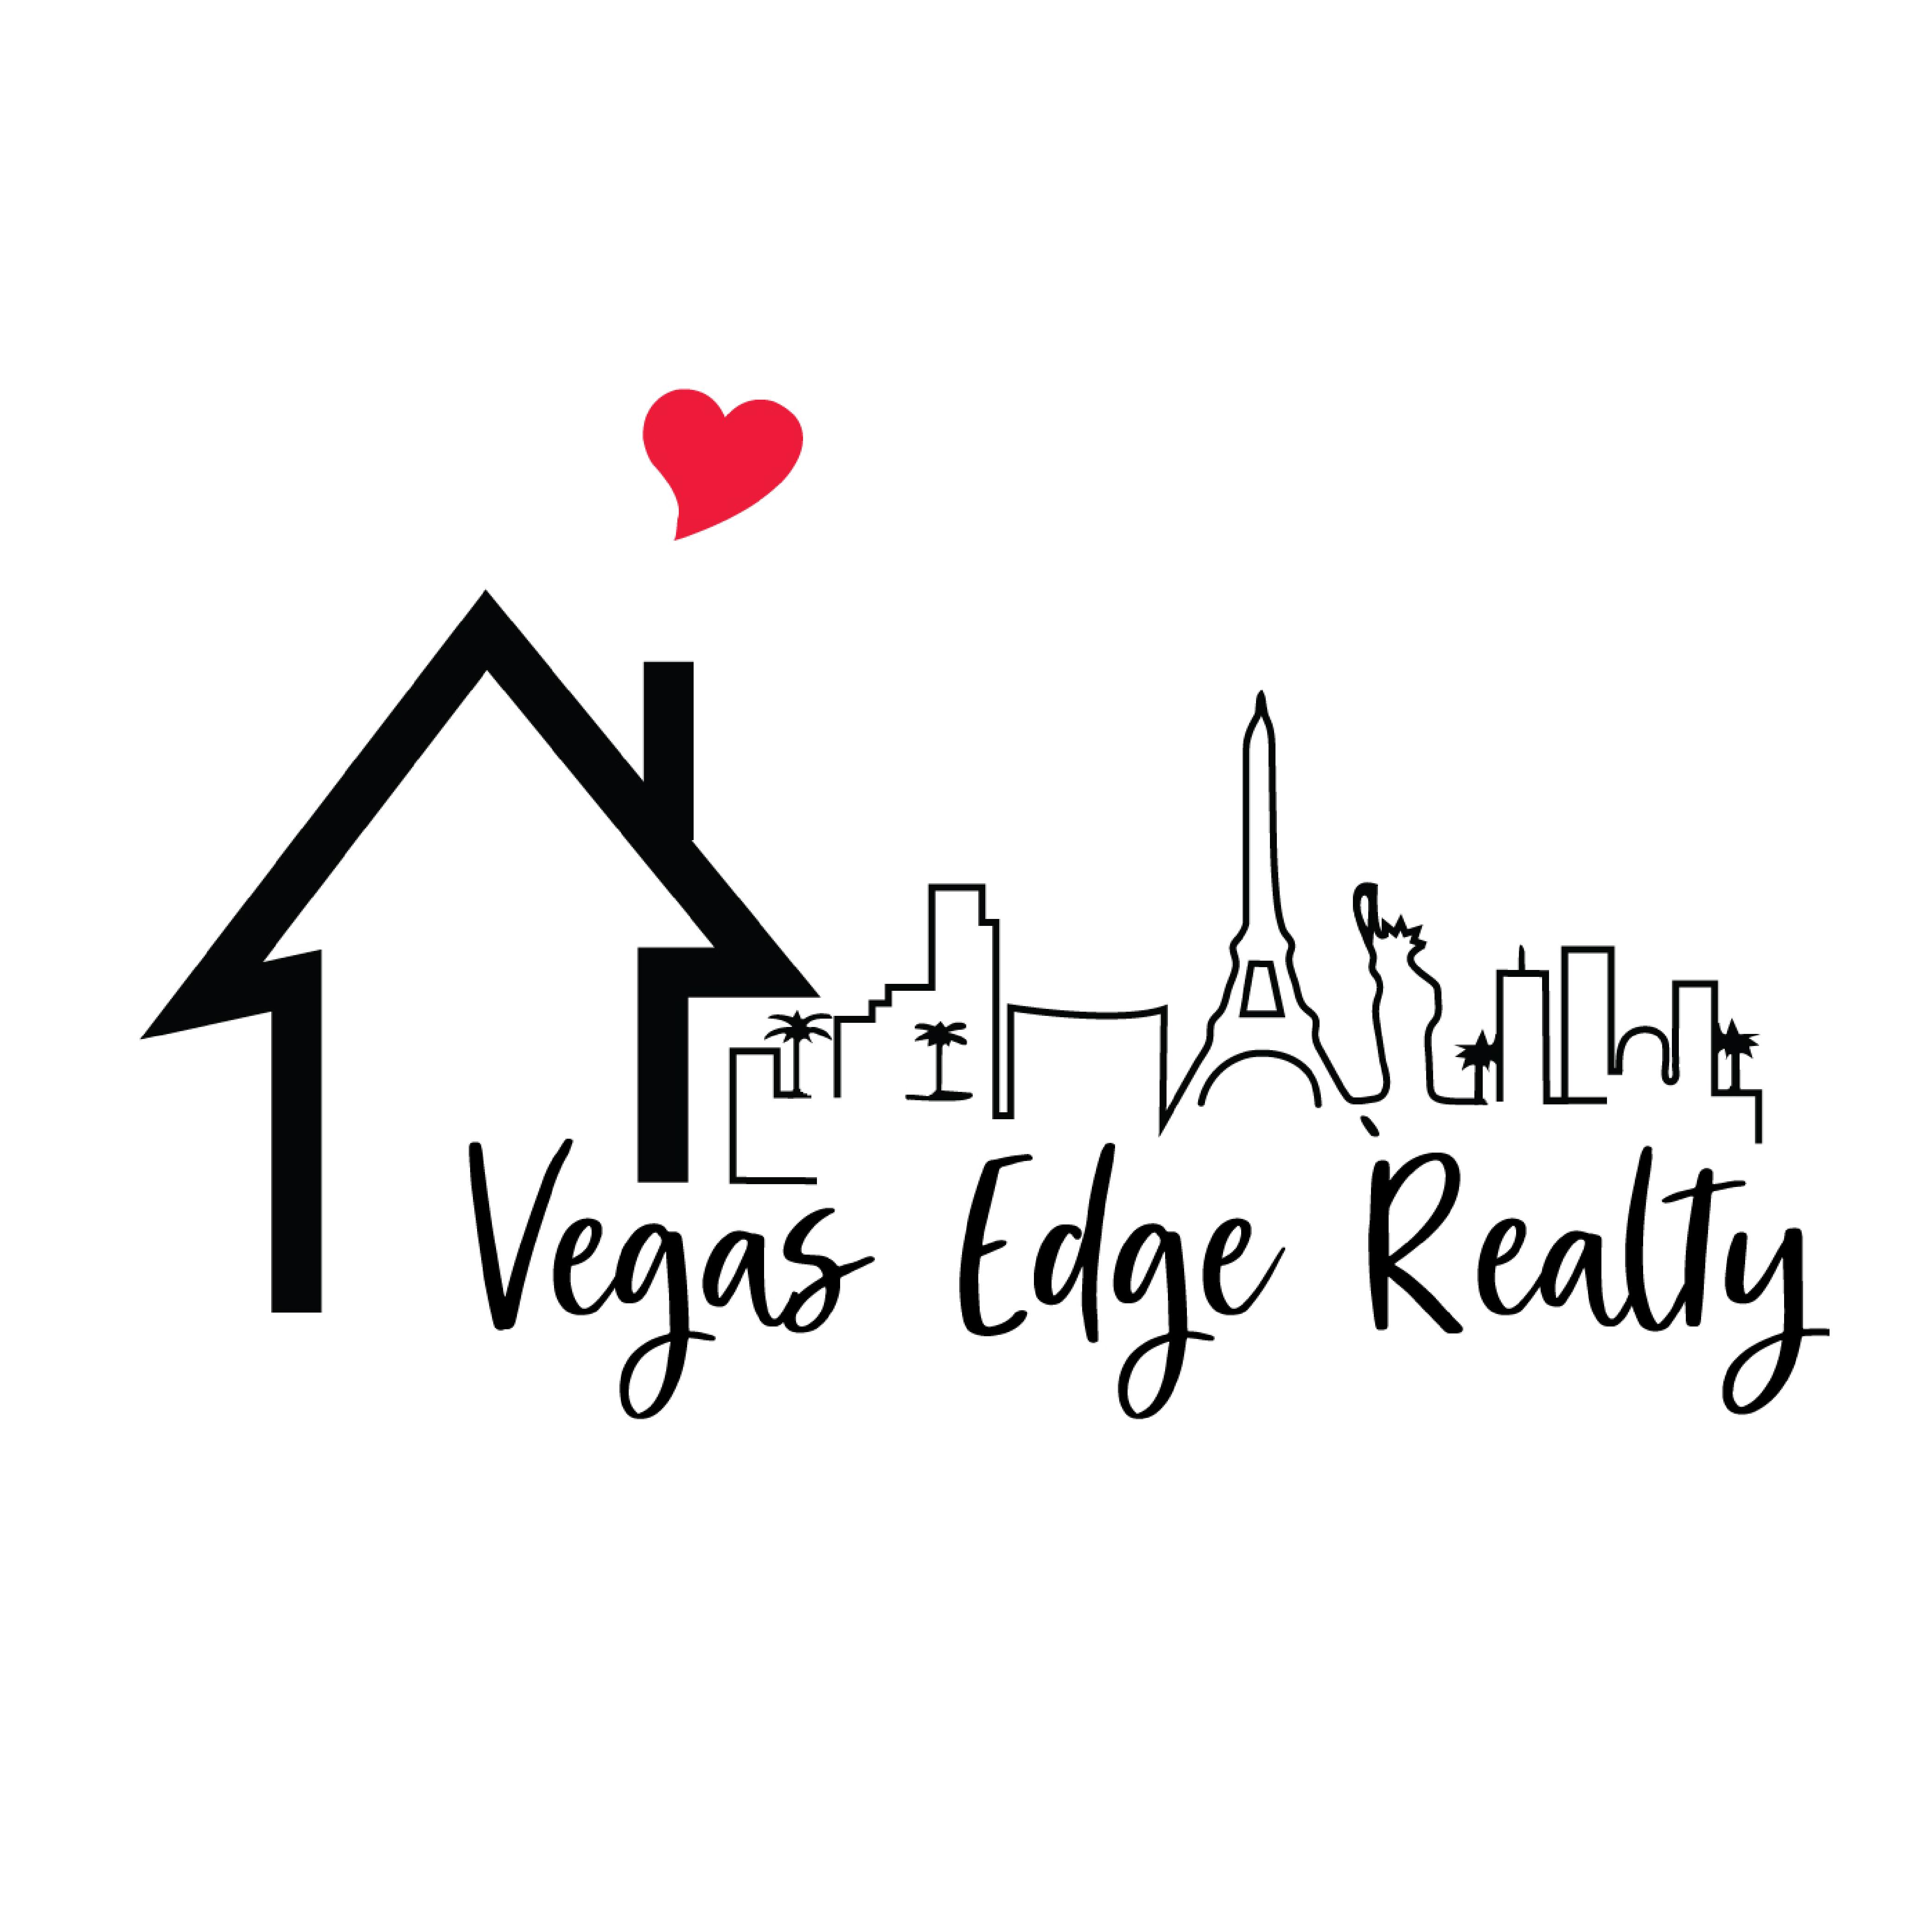 Vegar edge reality01 (3)